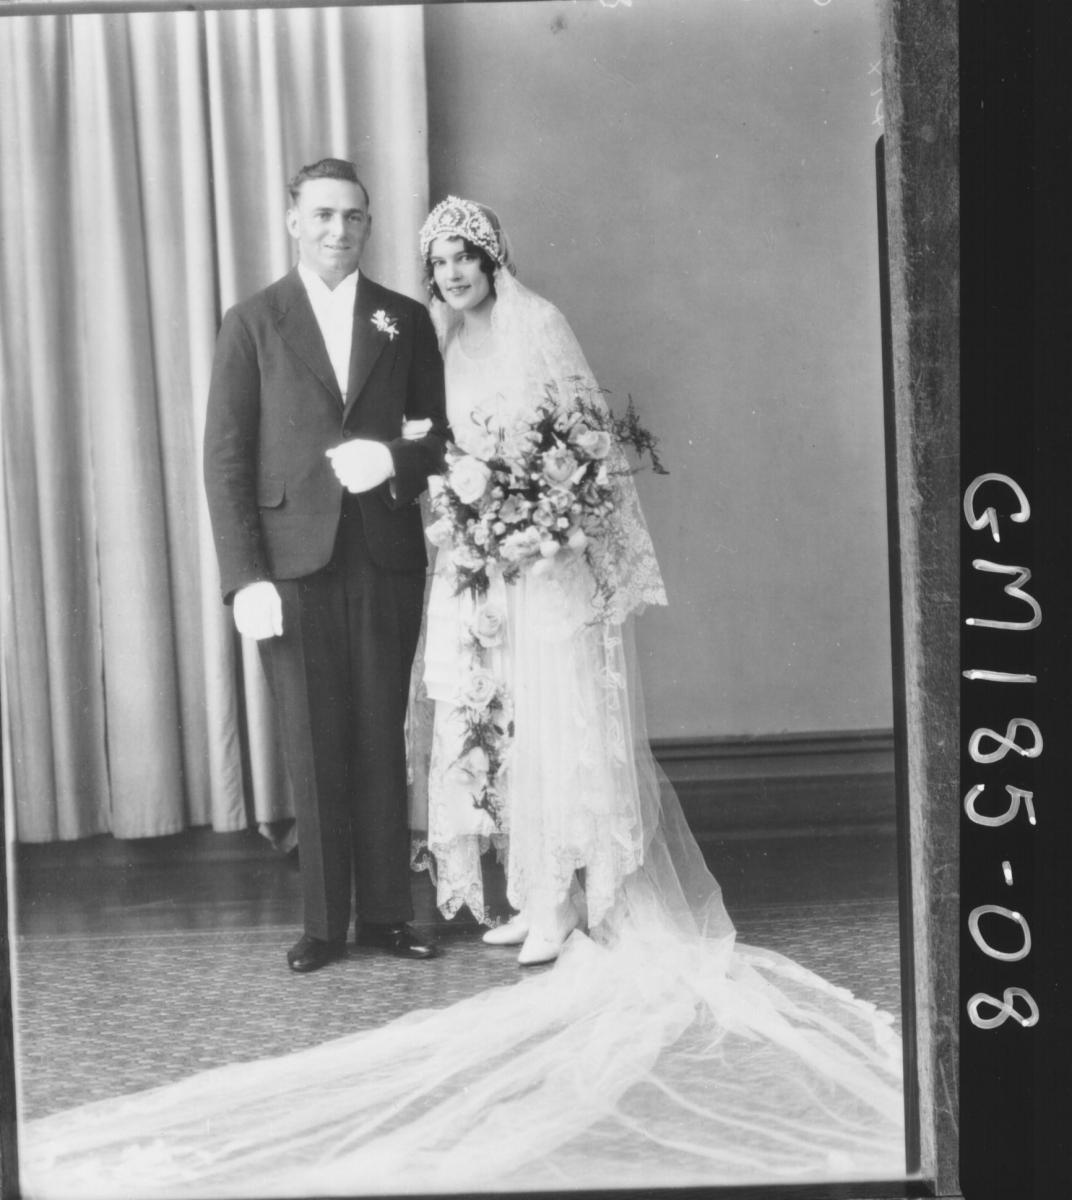 Copy of wedding group 'Dix'